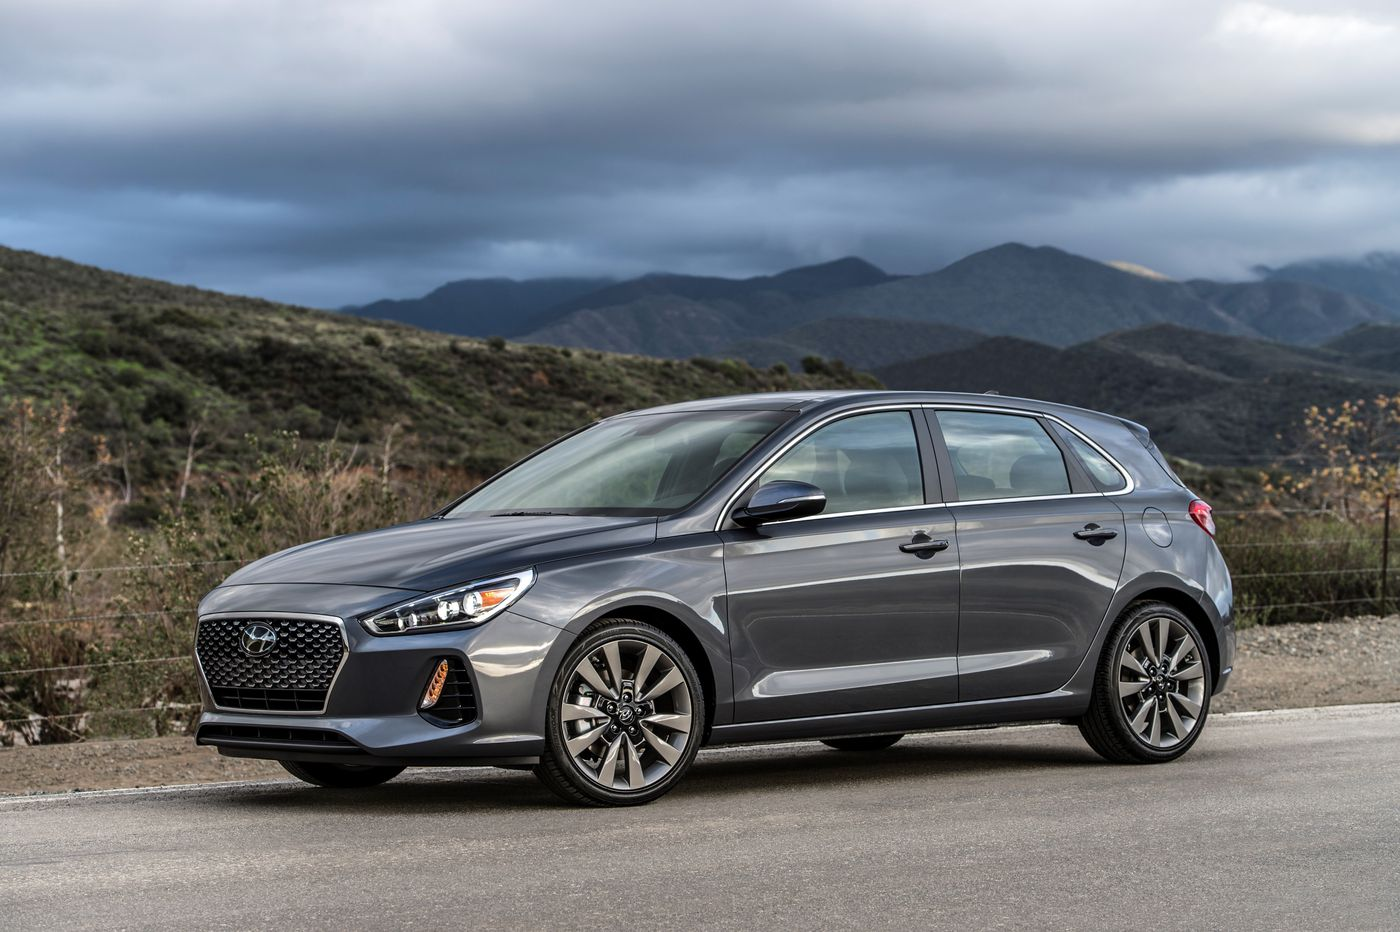 2018 Hyundai Elantra GT is sporty but no GT Sport